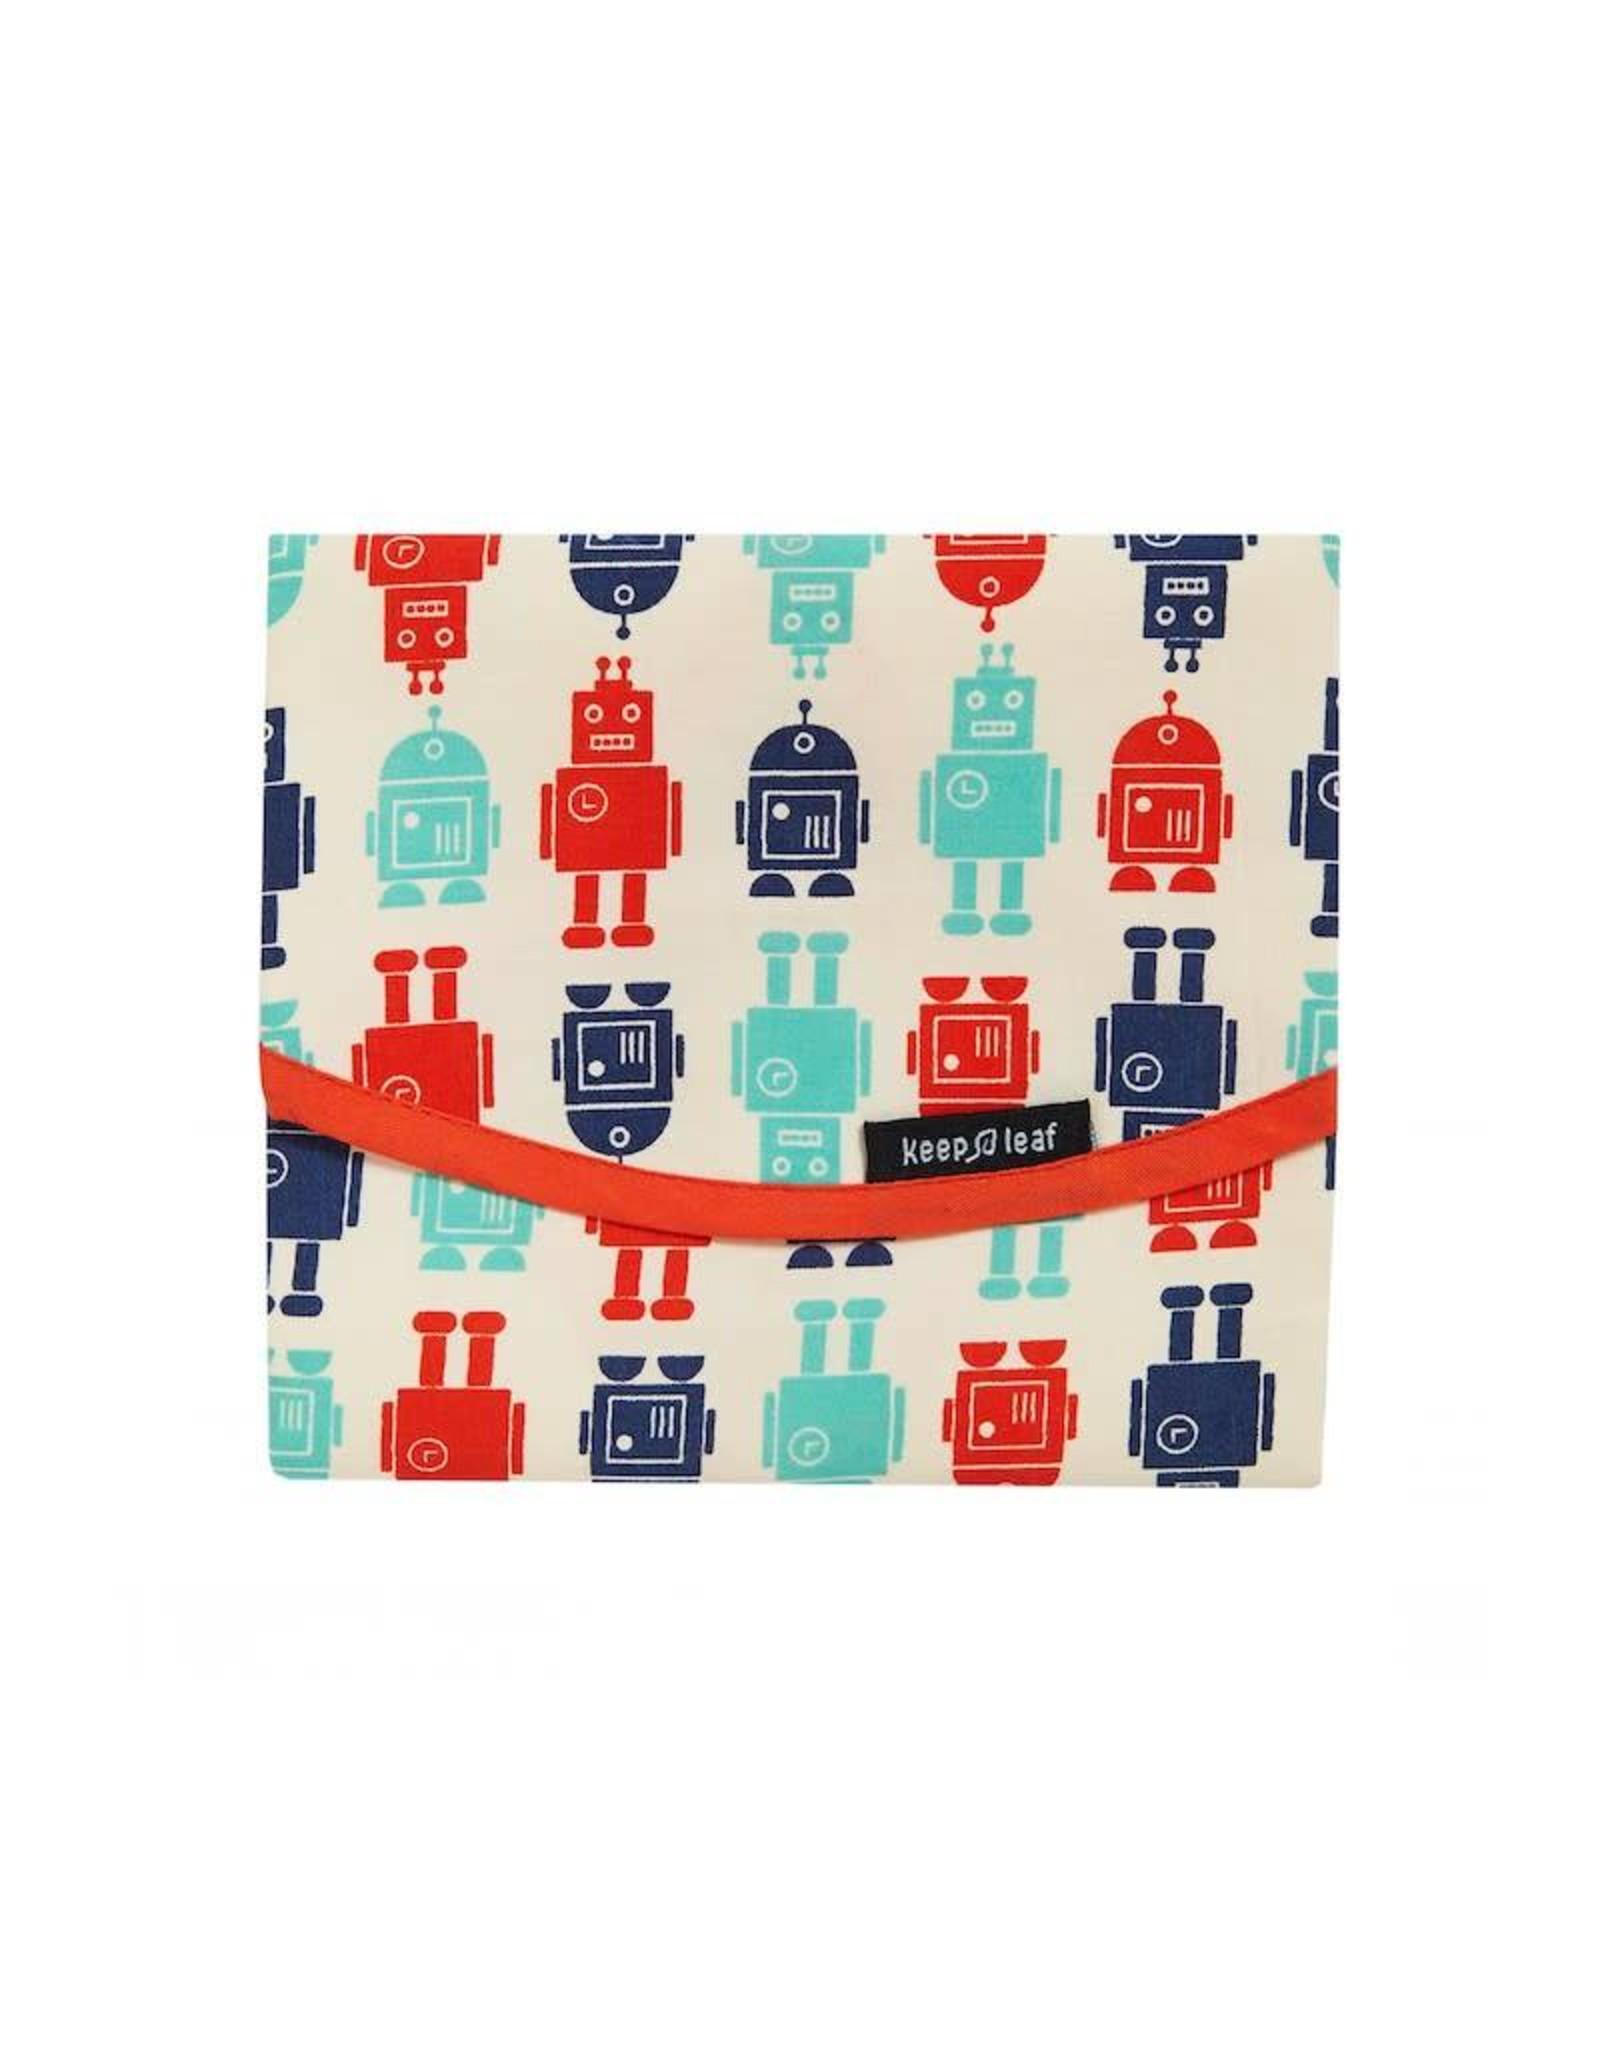 Food wrap robots